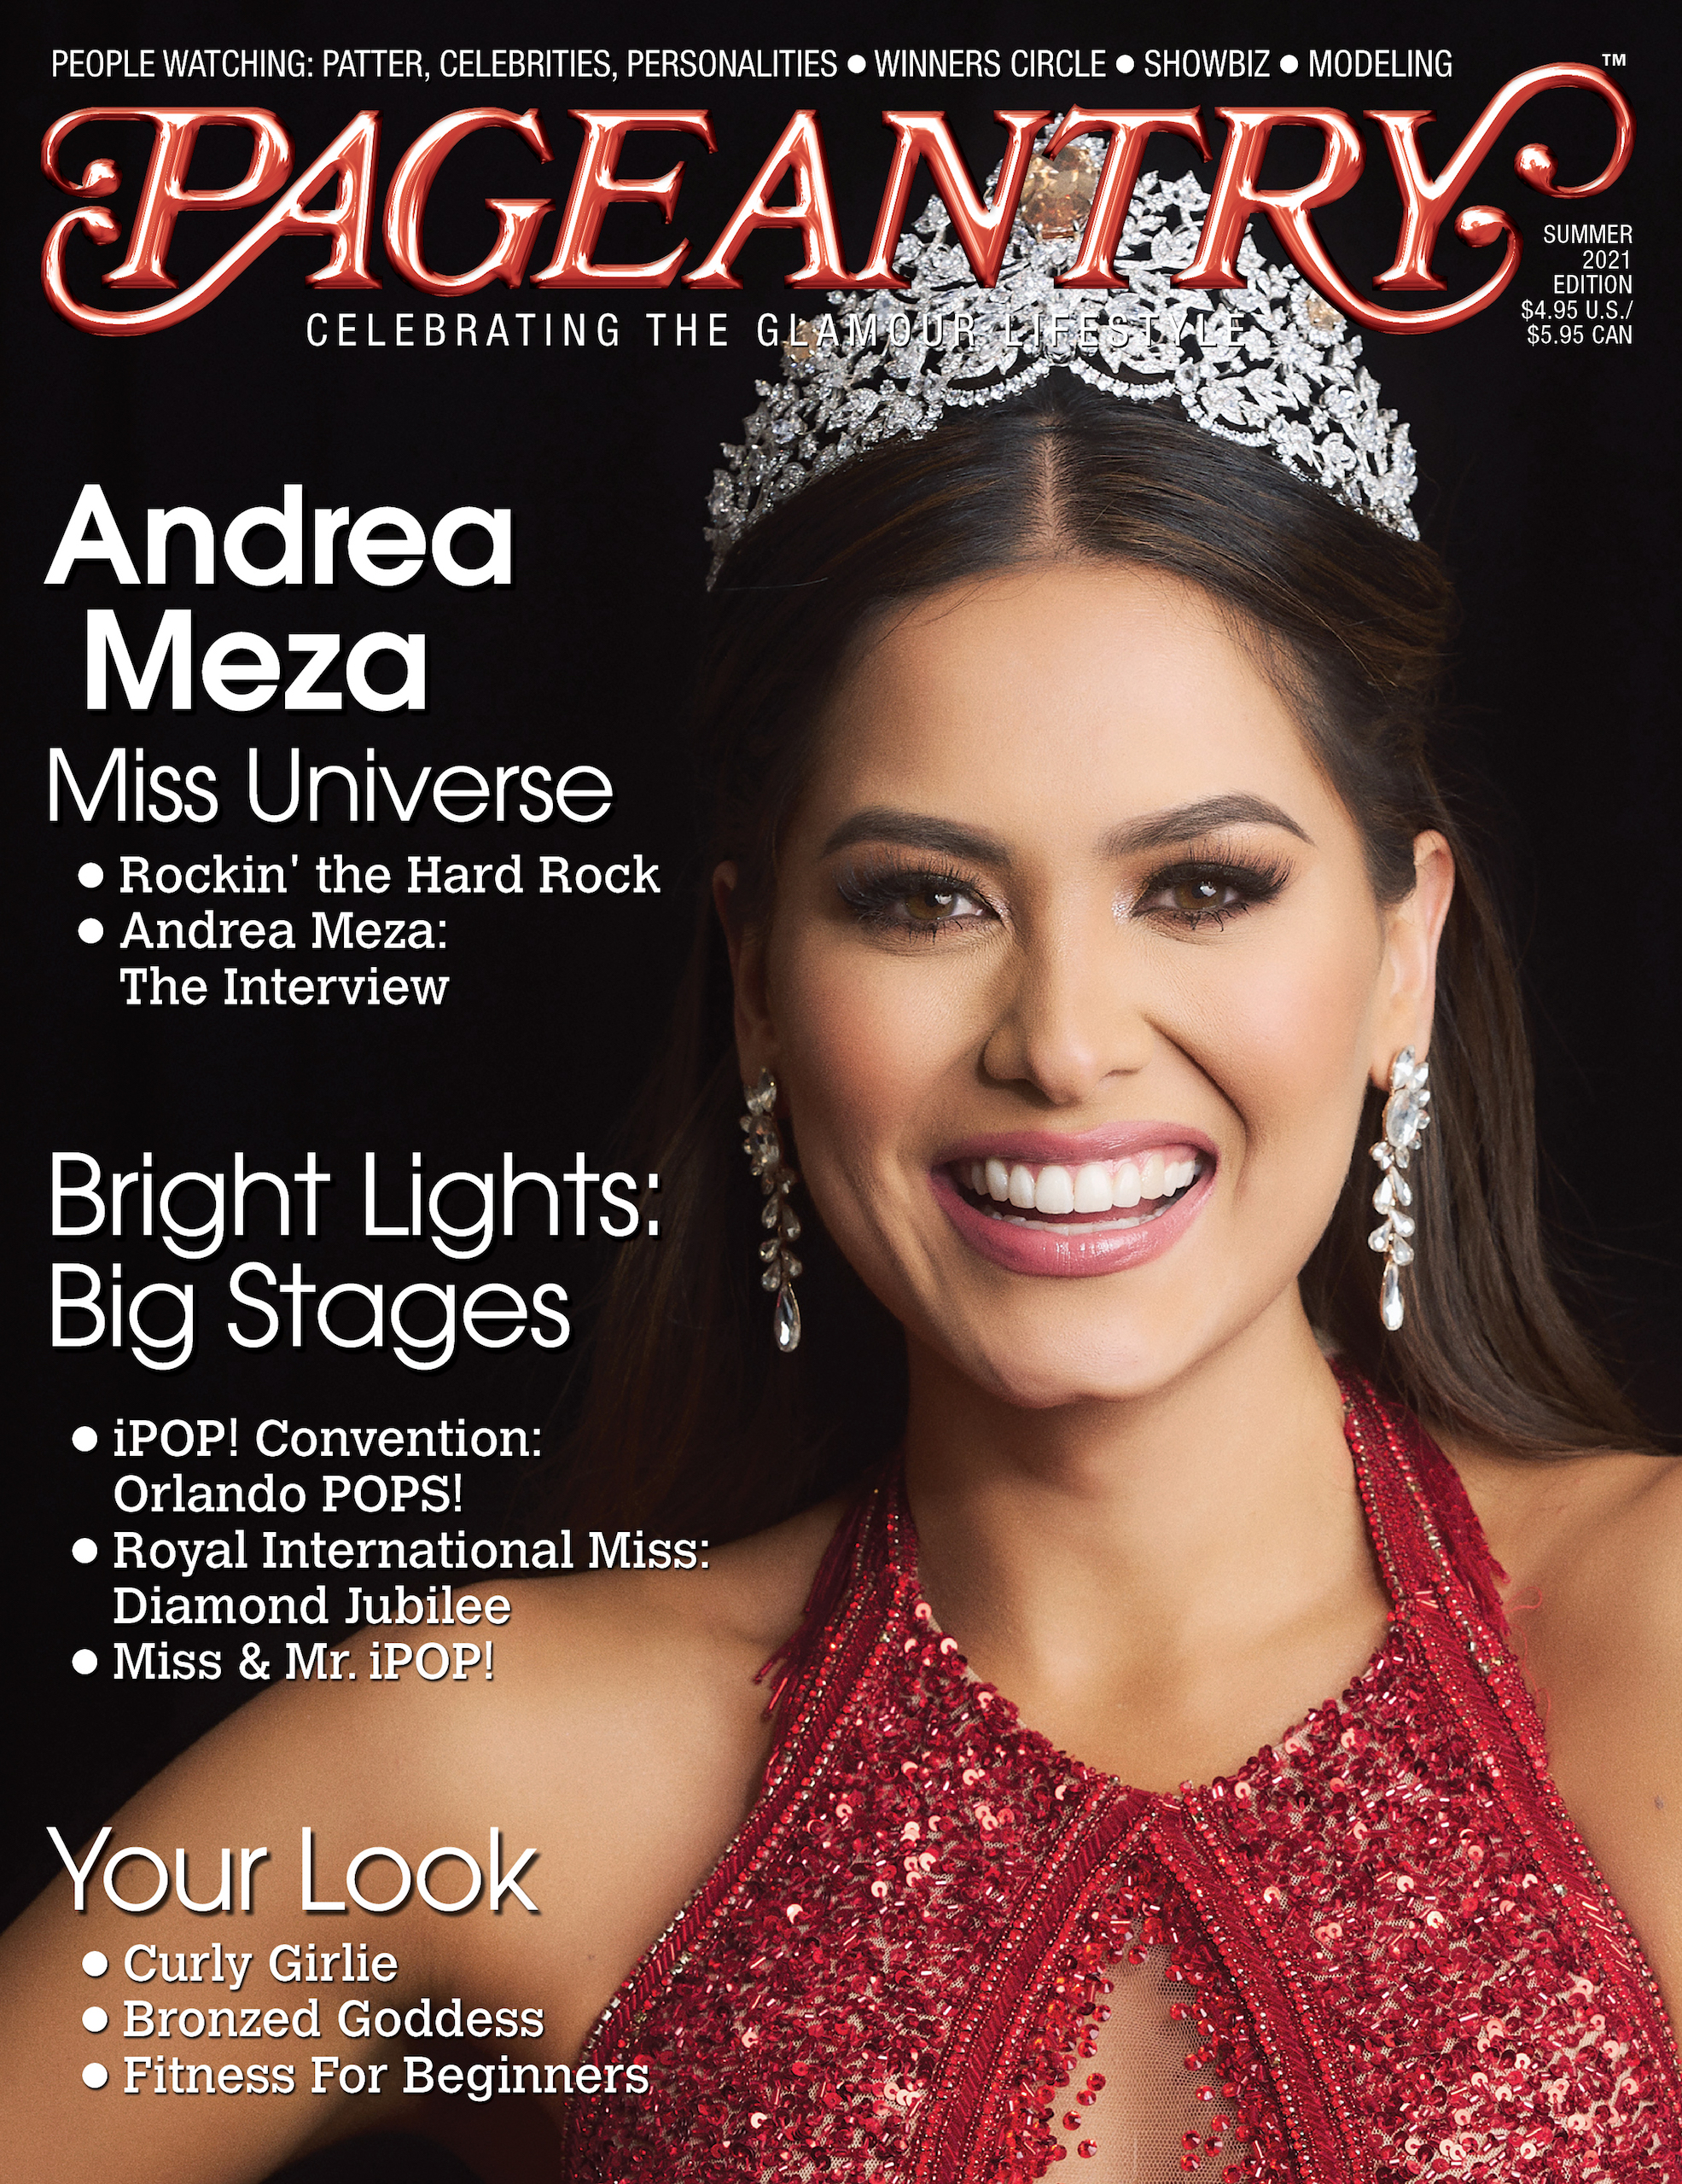 andrea meza, ipop!, royal international miss, beauty pageant, pageants